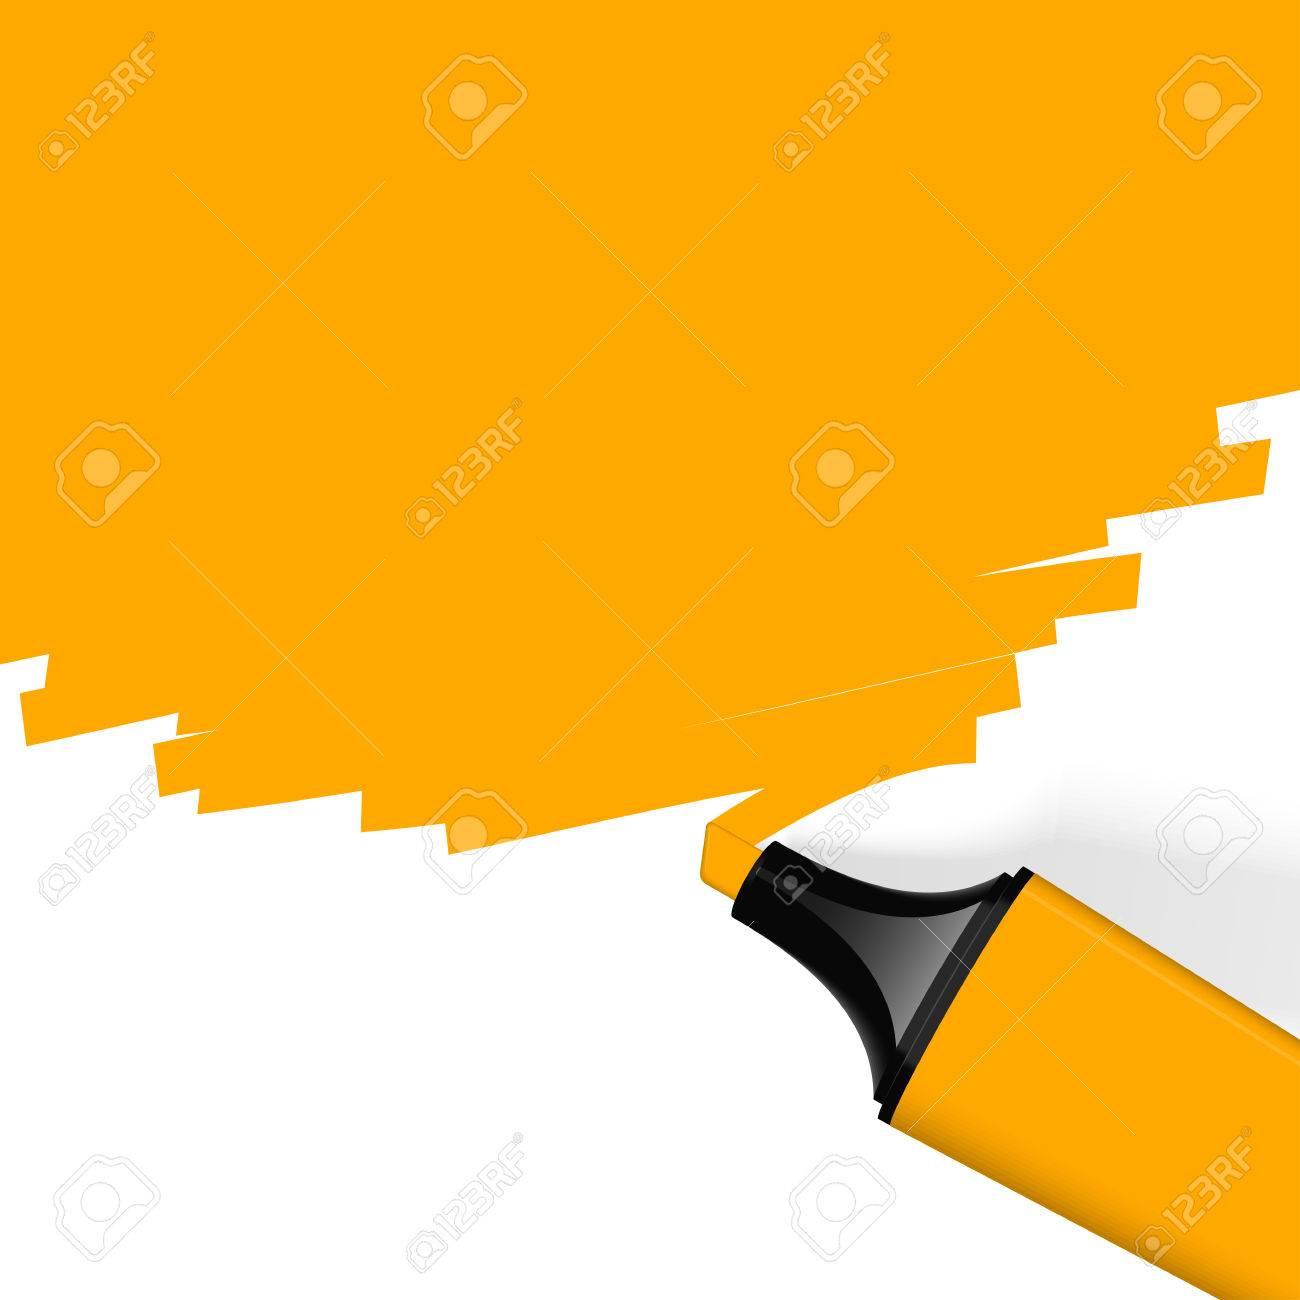 orange highlighter with marking - 29618107